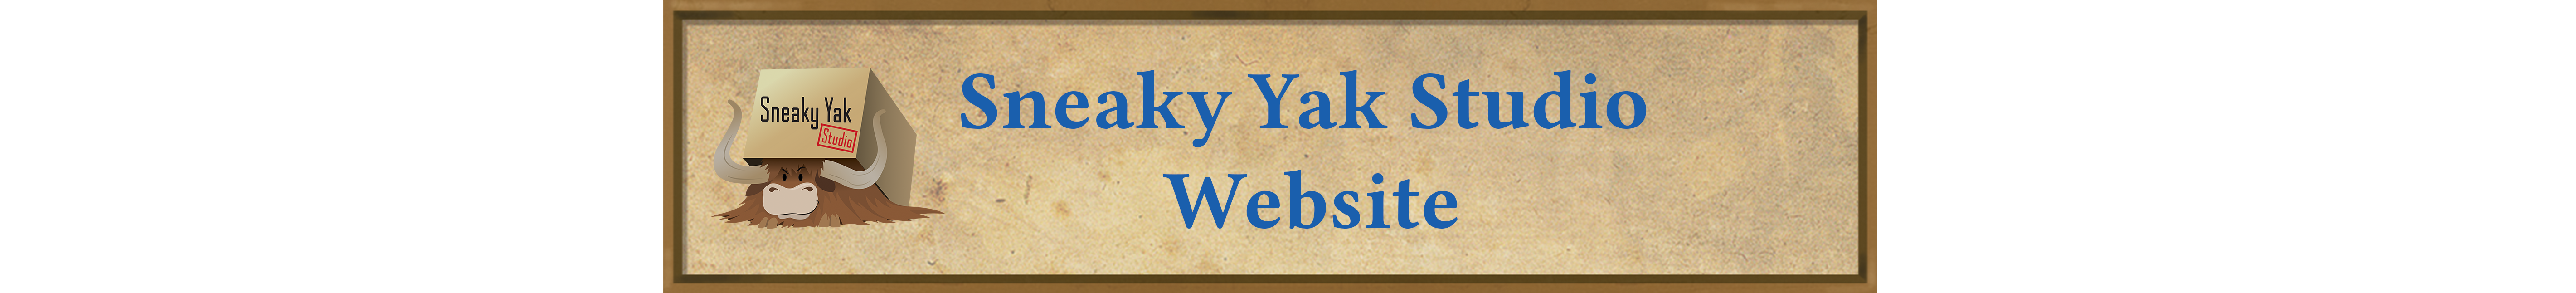 Sneaky Yak Studio.png